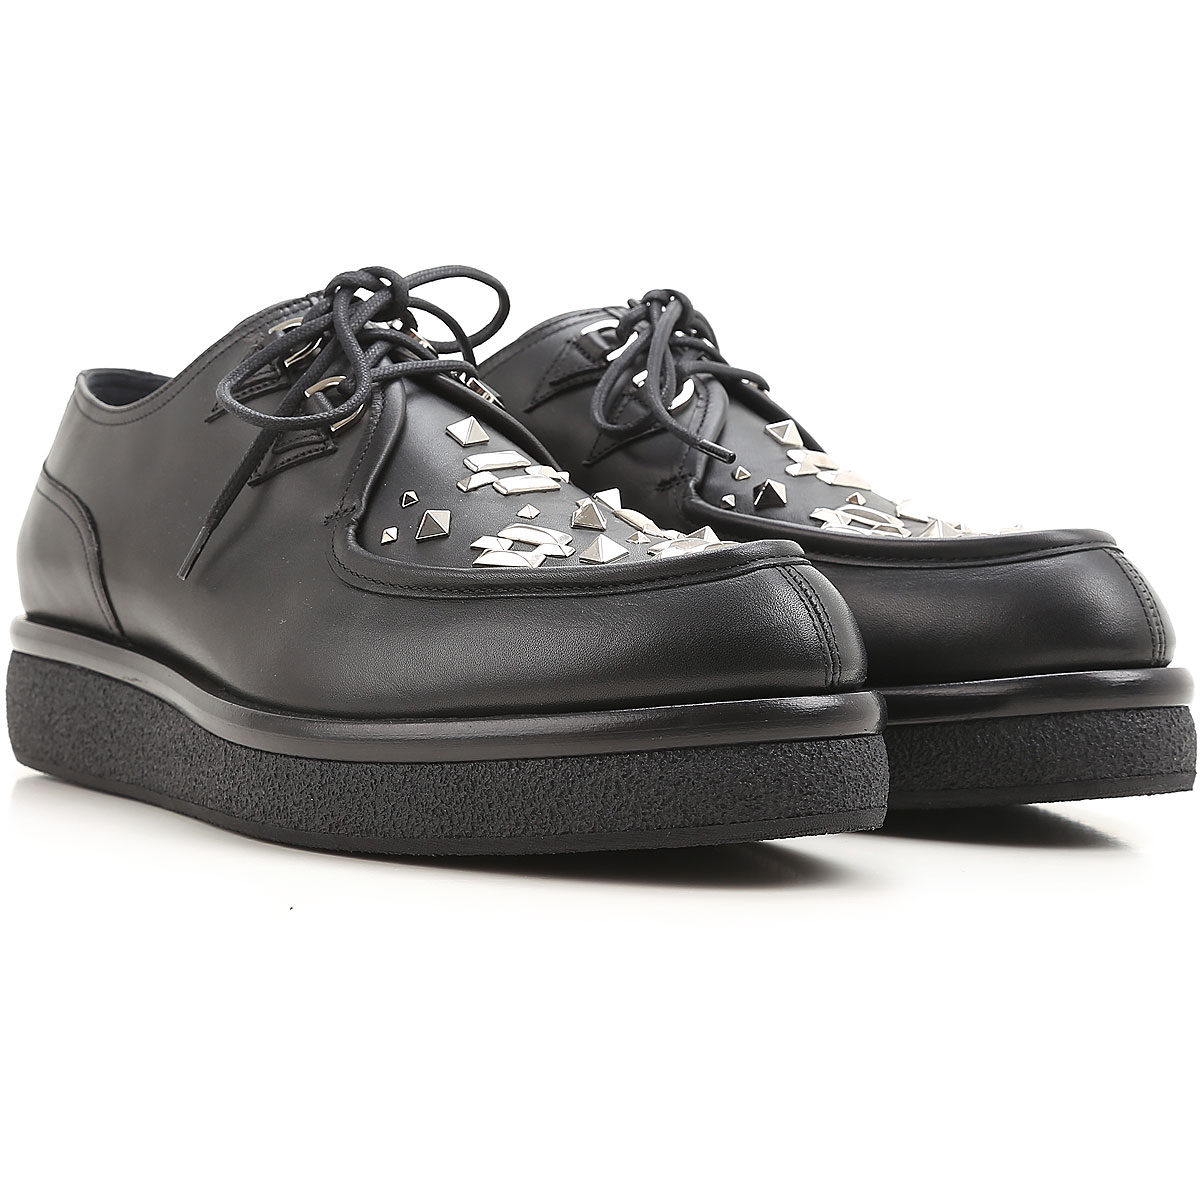 Mens Shoes Valentino Garavani. Style code: ny2s0a14ctx-0n0-